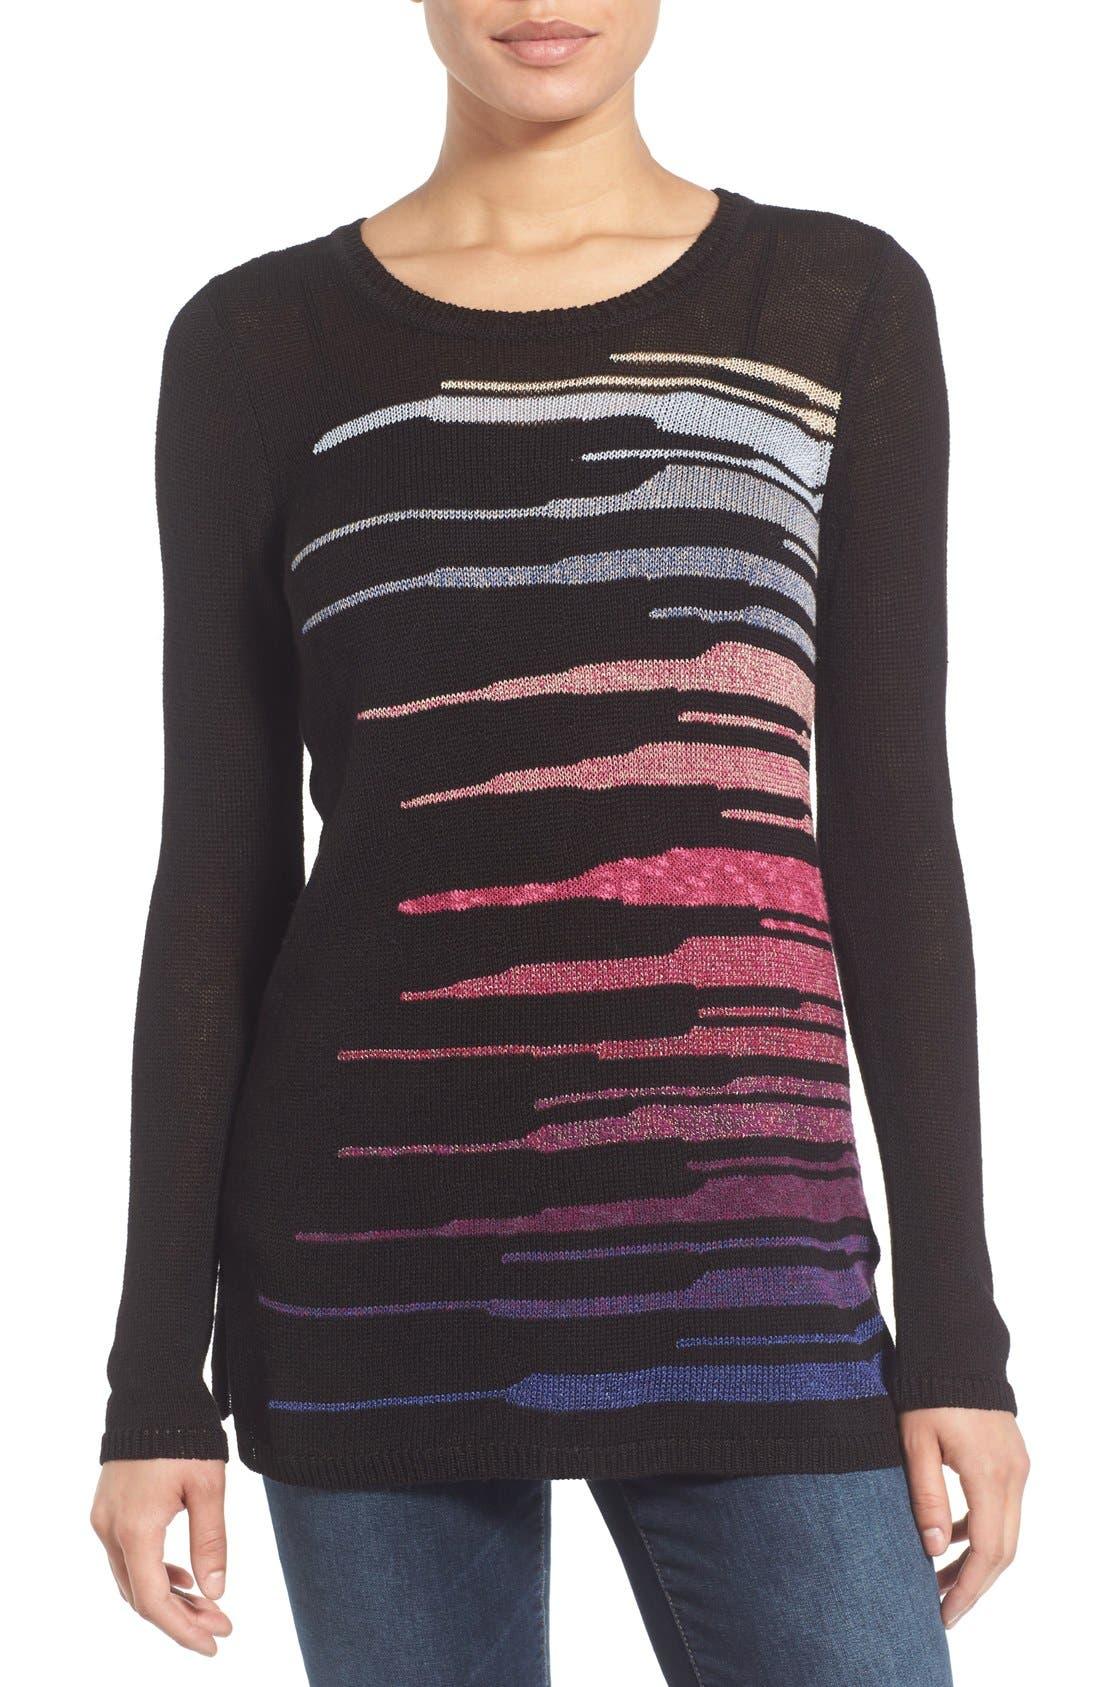 Alternate Image 1 Selected - NIC+ZOE 'Speared' Print Lightweight Sweater